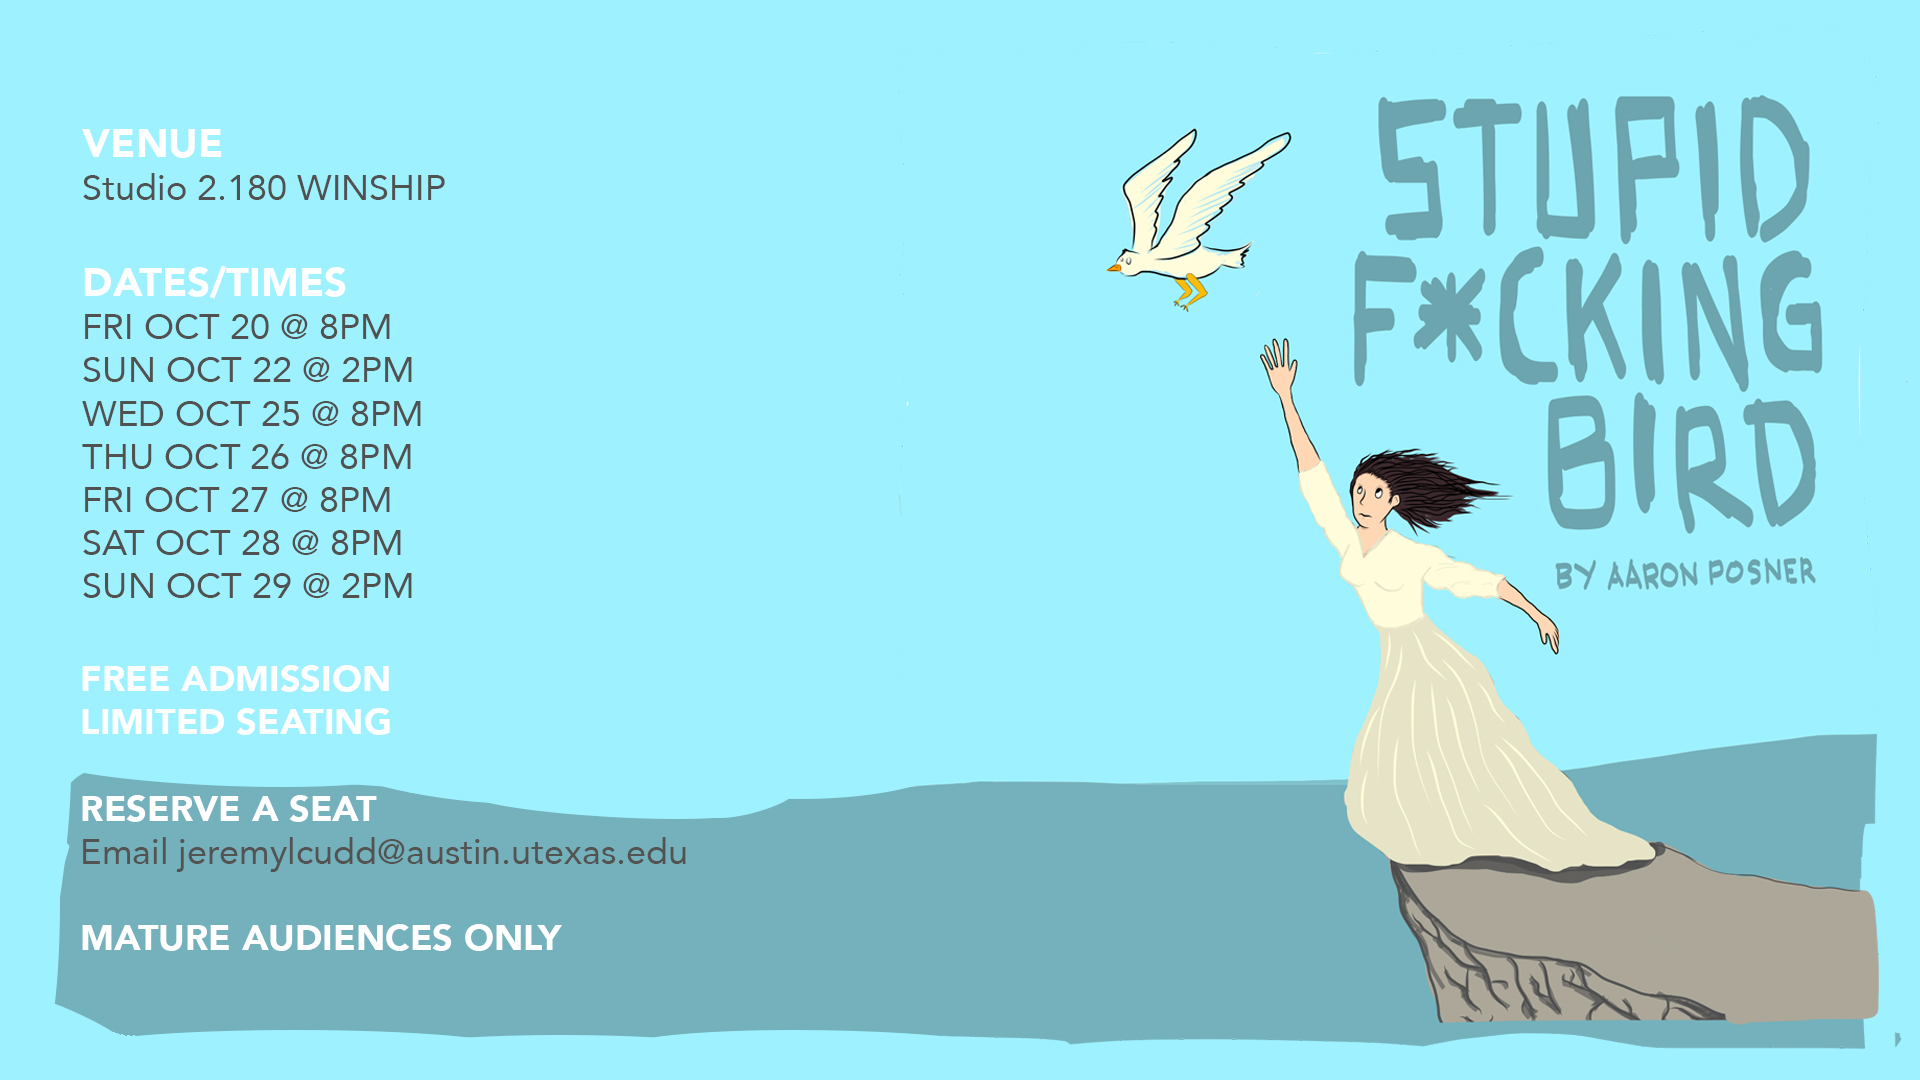 Stupid-F_cking-Bird-Poster-with-Info-16x9-layout.jpg